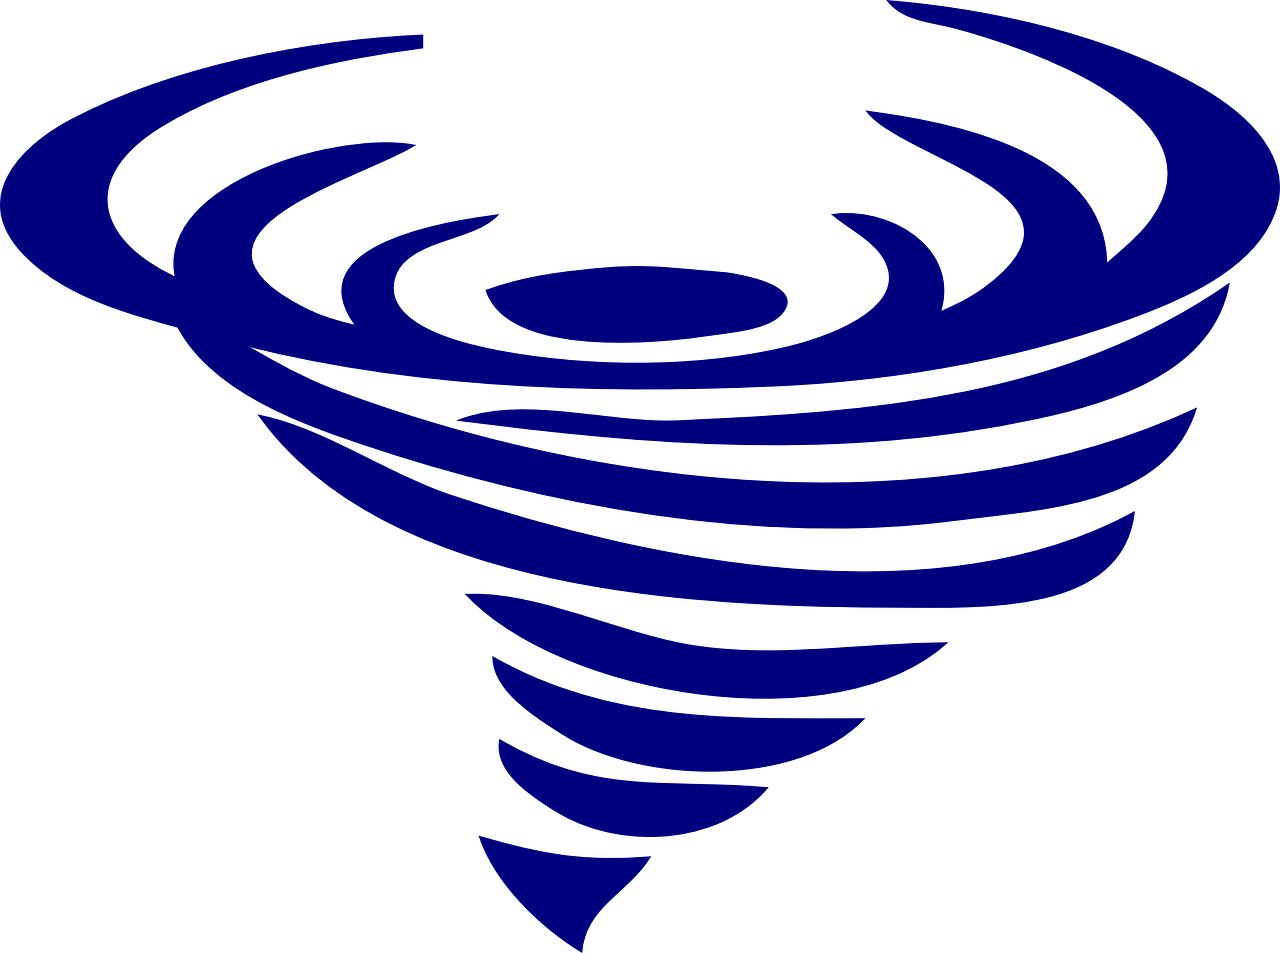 Twister Tornado Typhoon Spiral PNG.